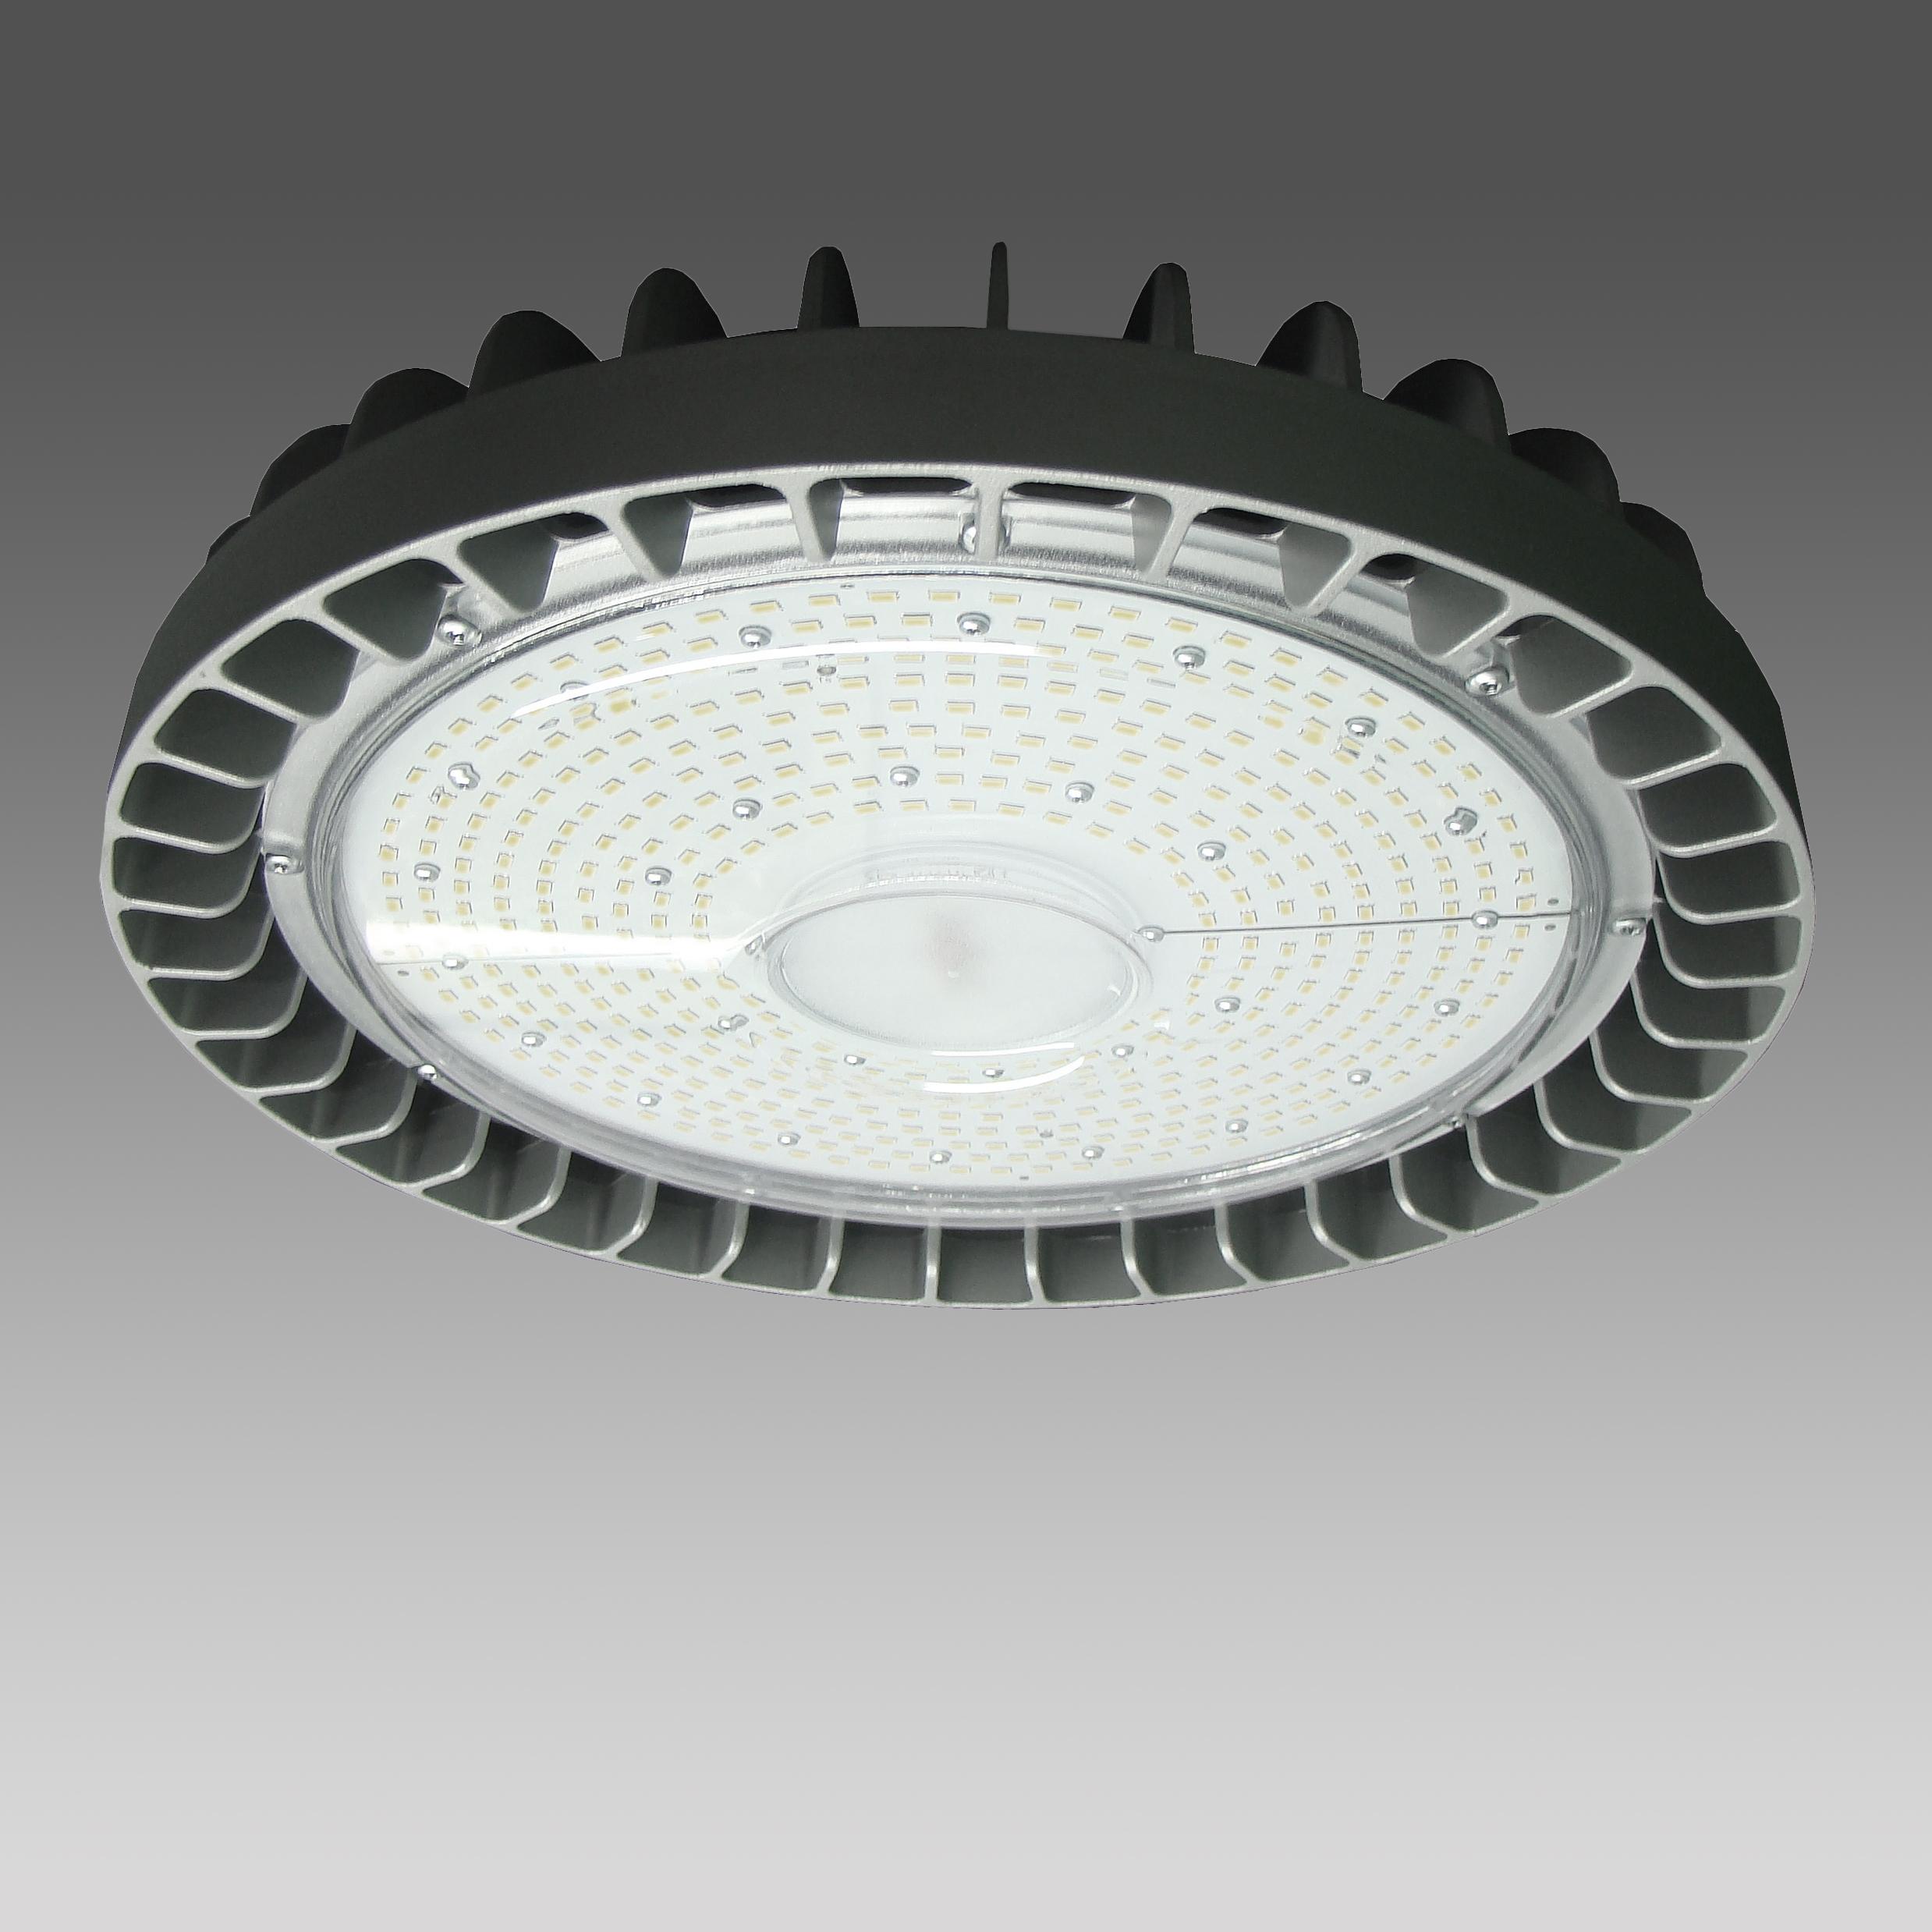 1 Stk Arktur Round II LED 160W, 21000lm, 4000K, 120°, DALI LIHB21000-